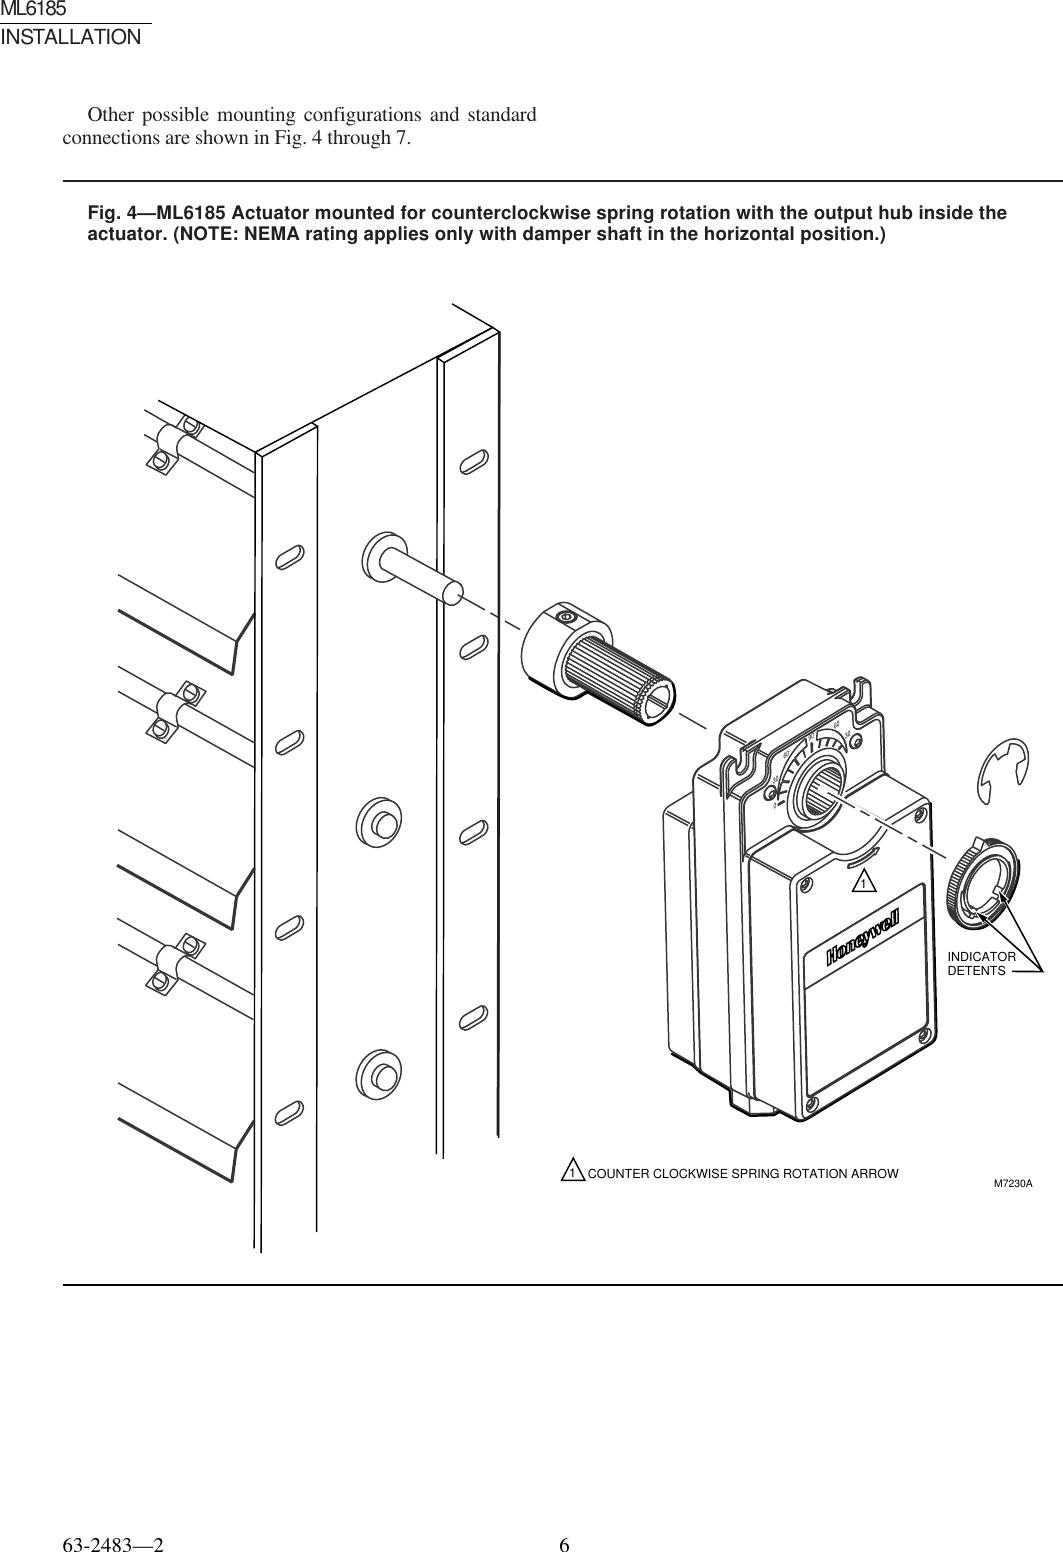 Honeywell Ml6185 Users Manual 63 2483 Spring Return Direct Coupled. Page 6 Of 12 Honeywell Honeywellml6185usersmanual 63. Wiring. Honeywell Direct Coupled Actuator Wiring Diagram At Scoala.co